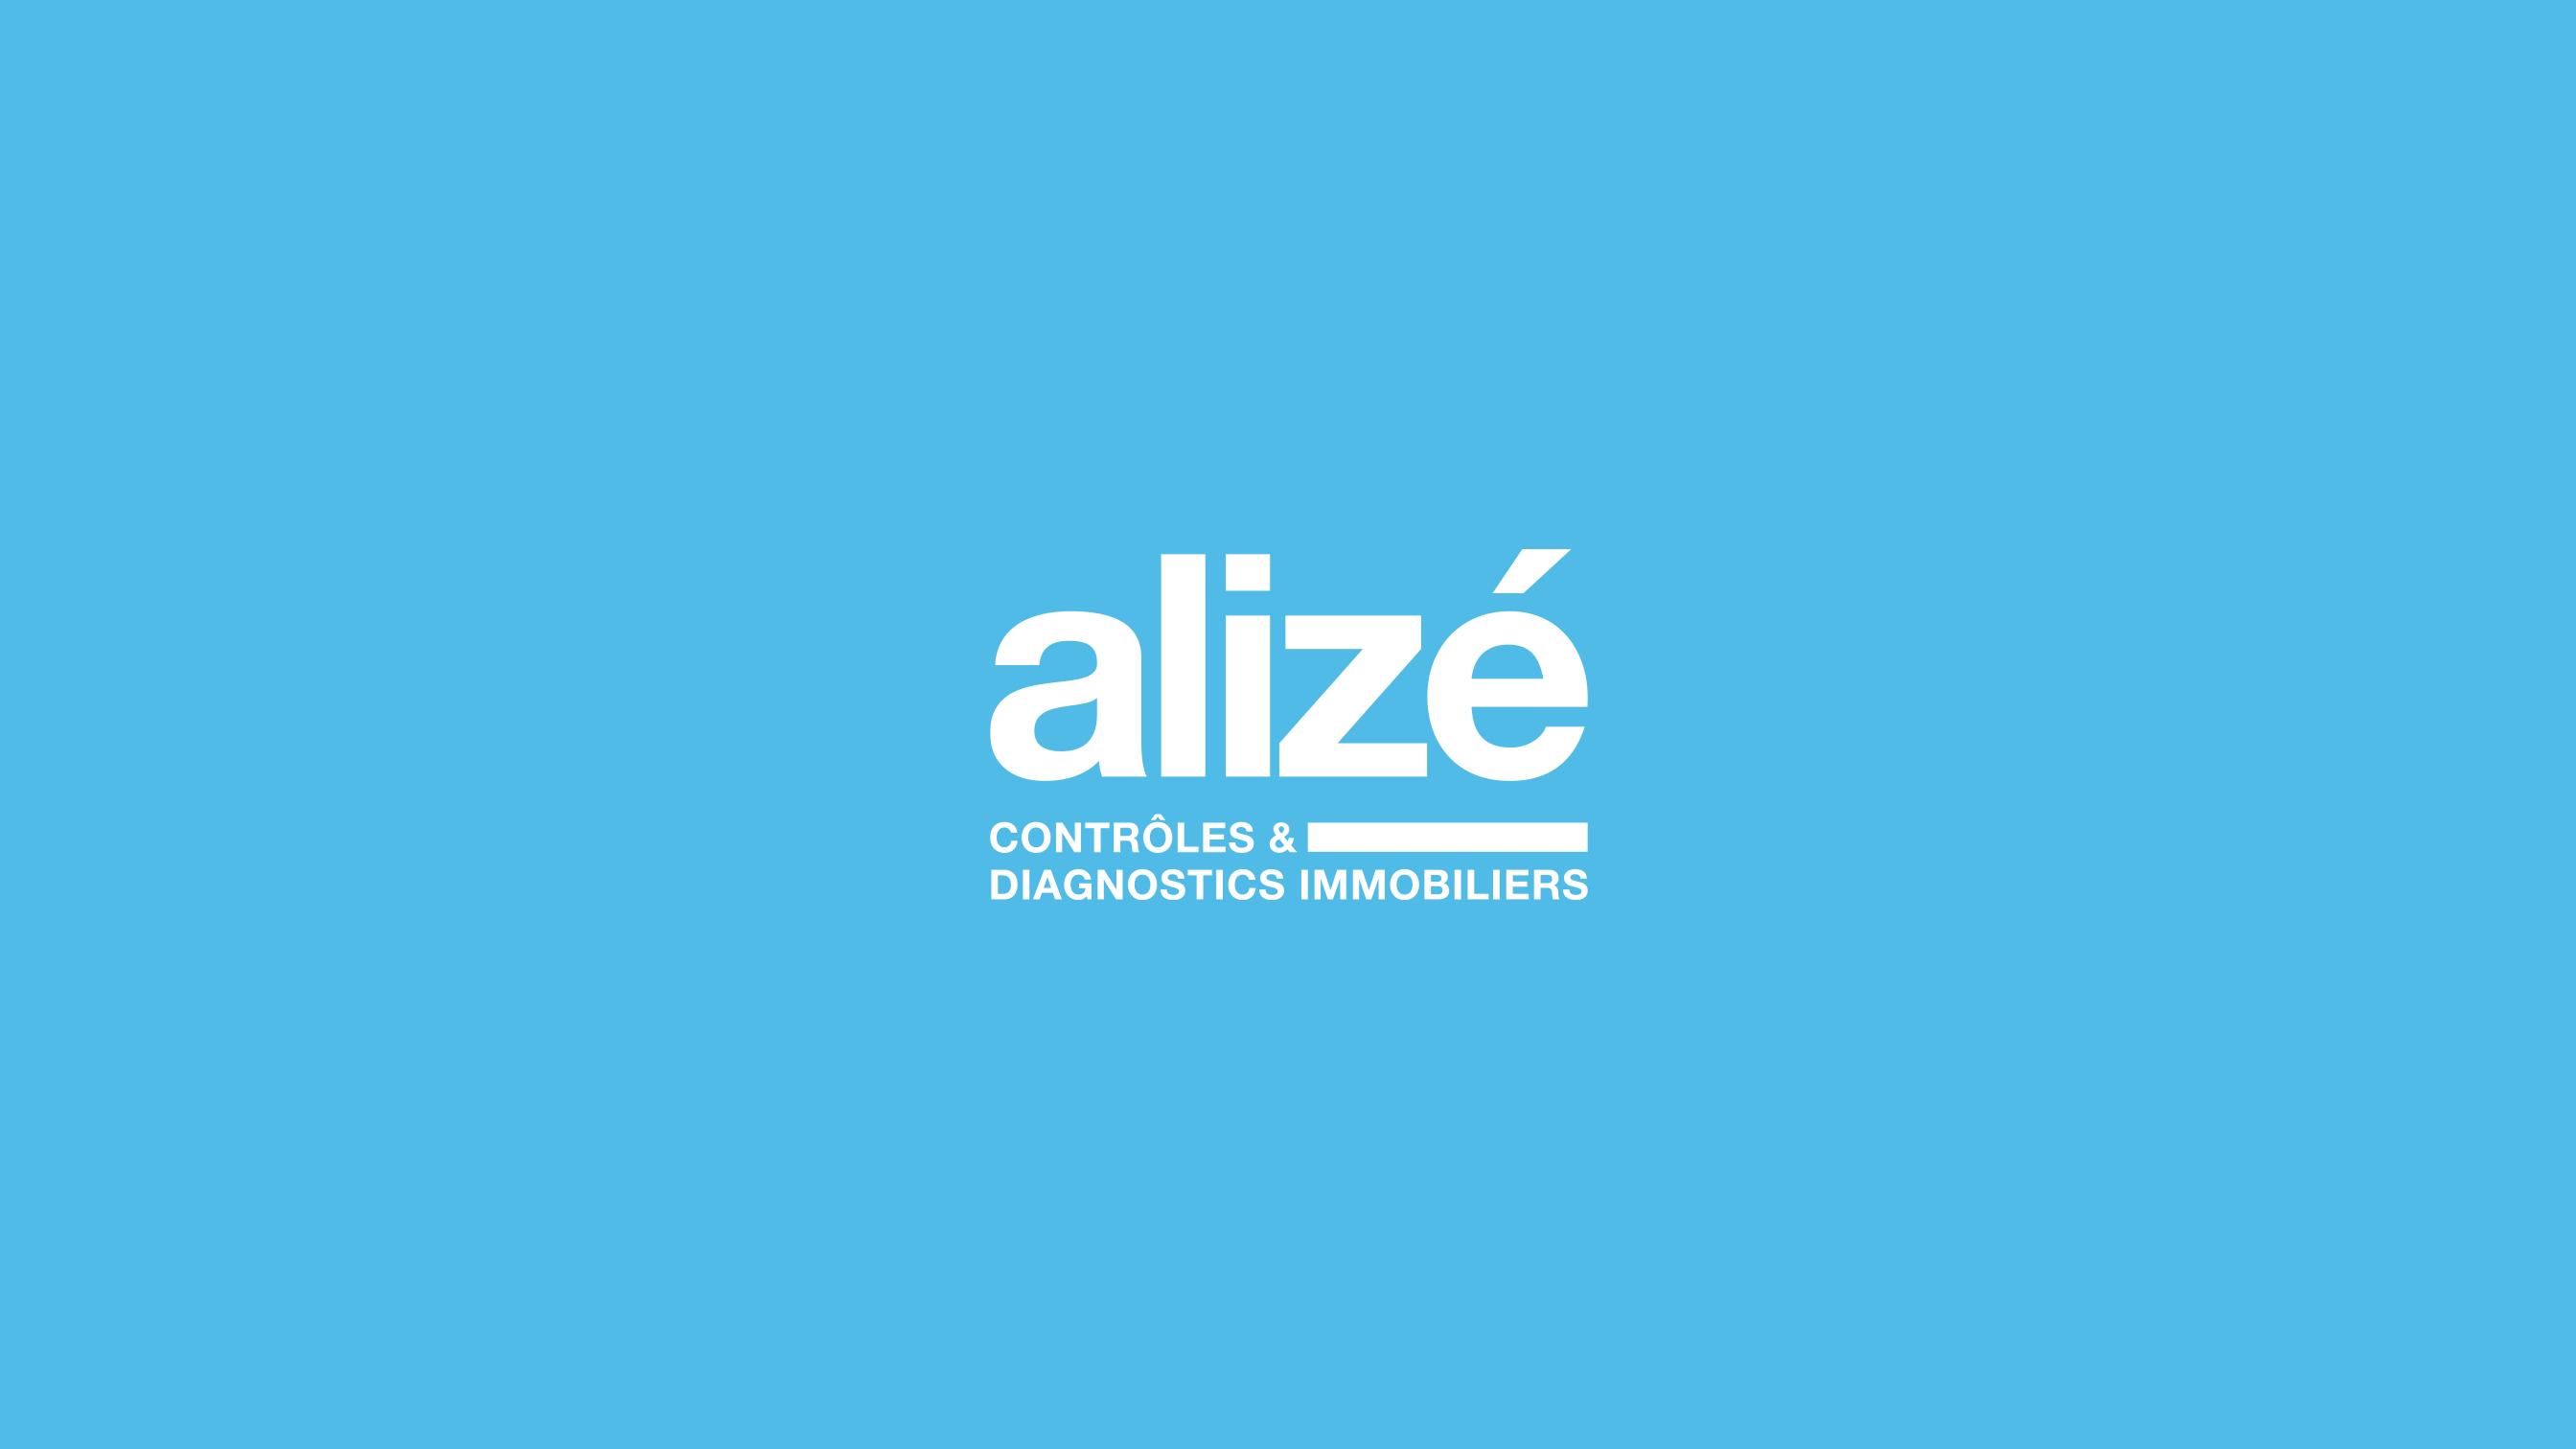 alize-logotype-logotype-pikteo